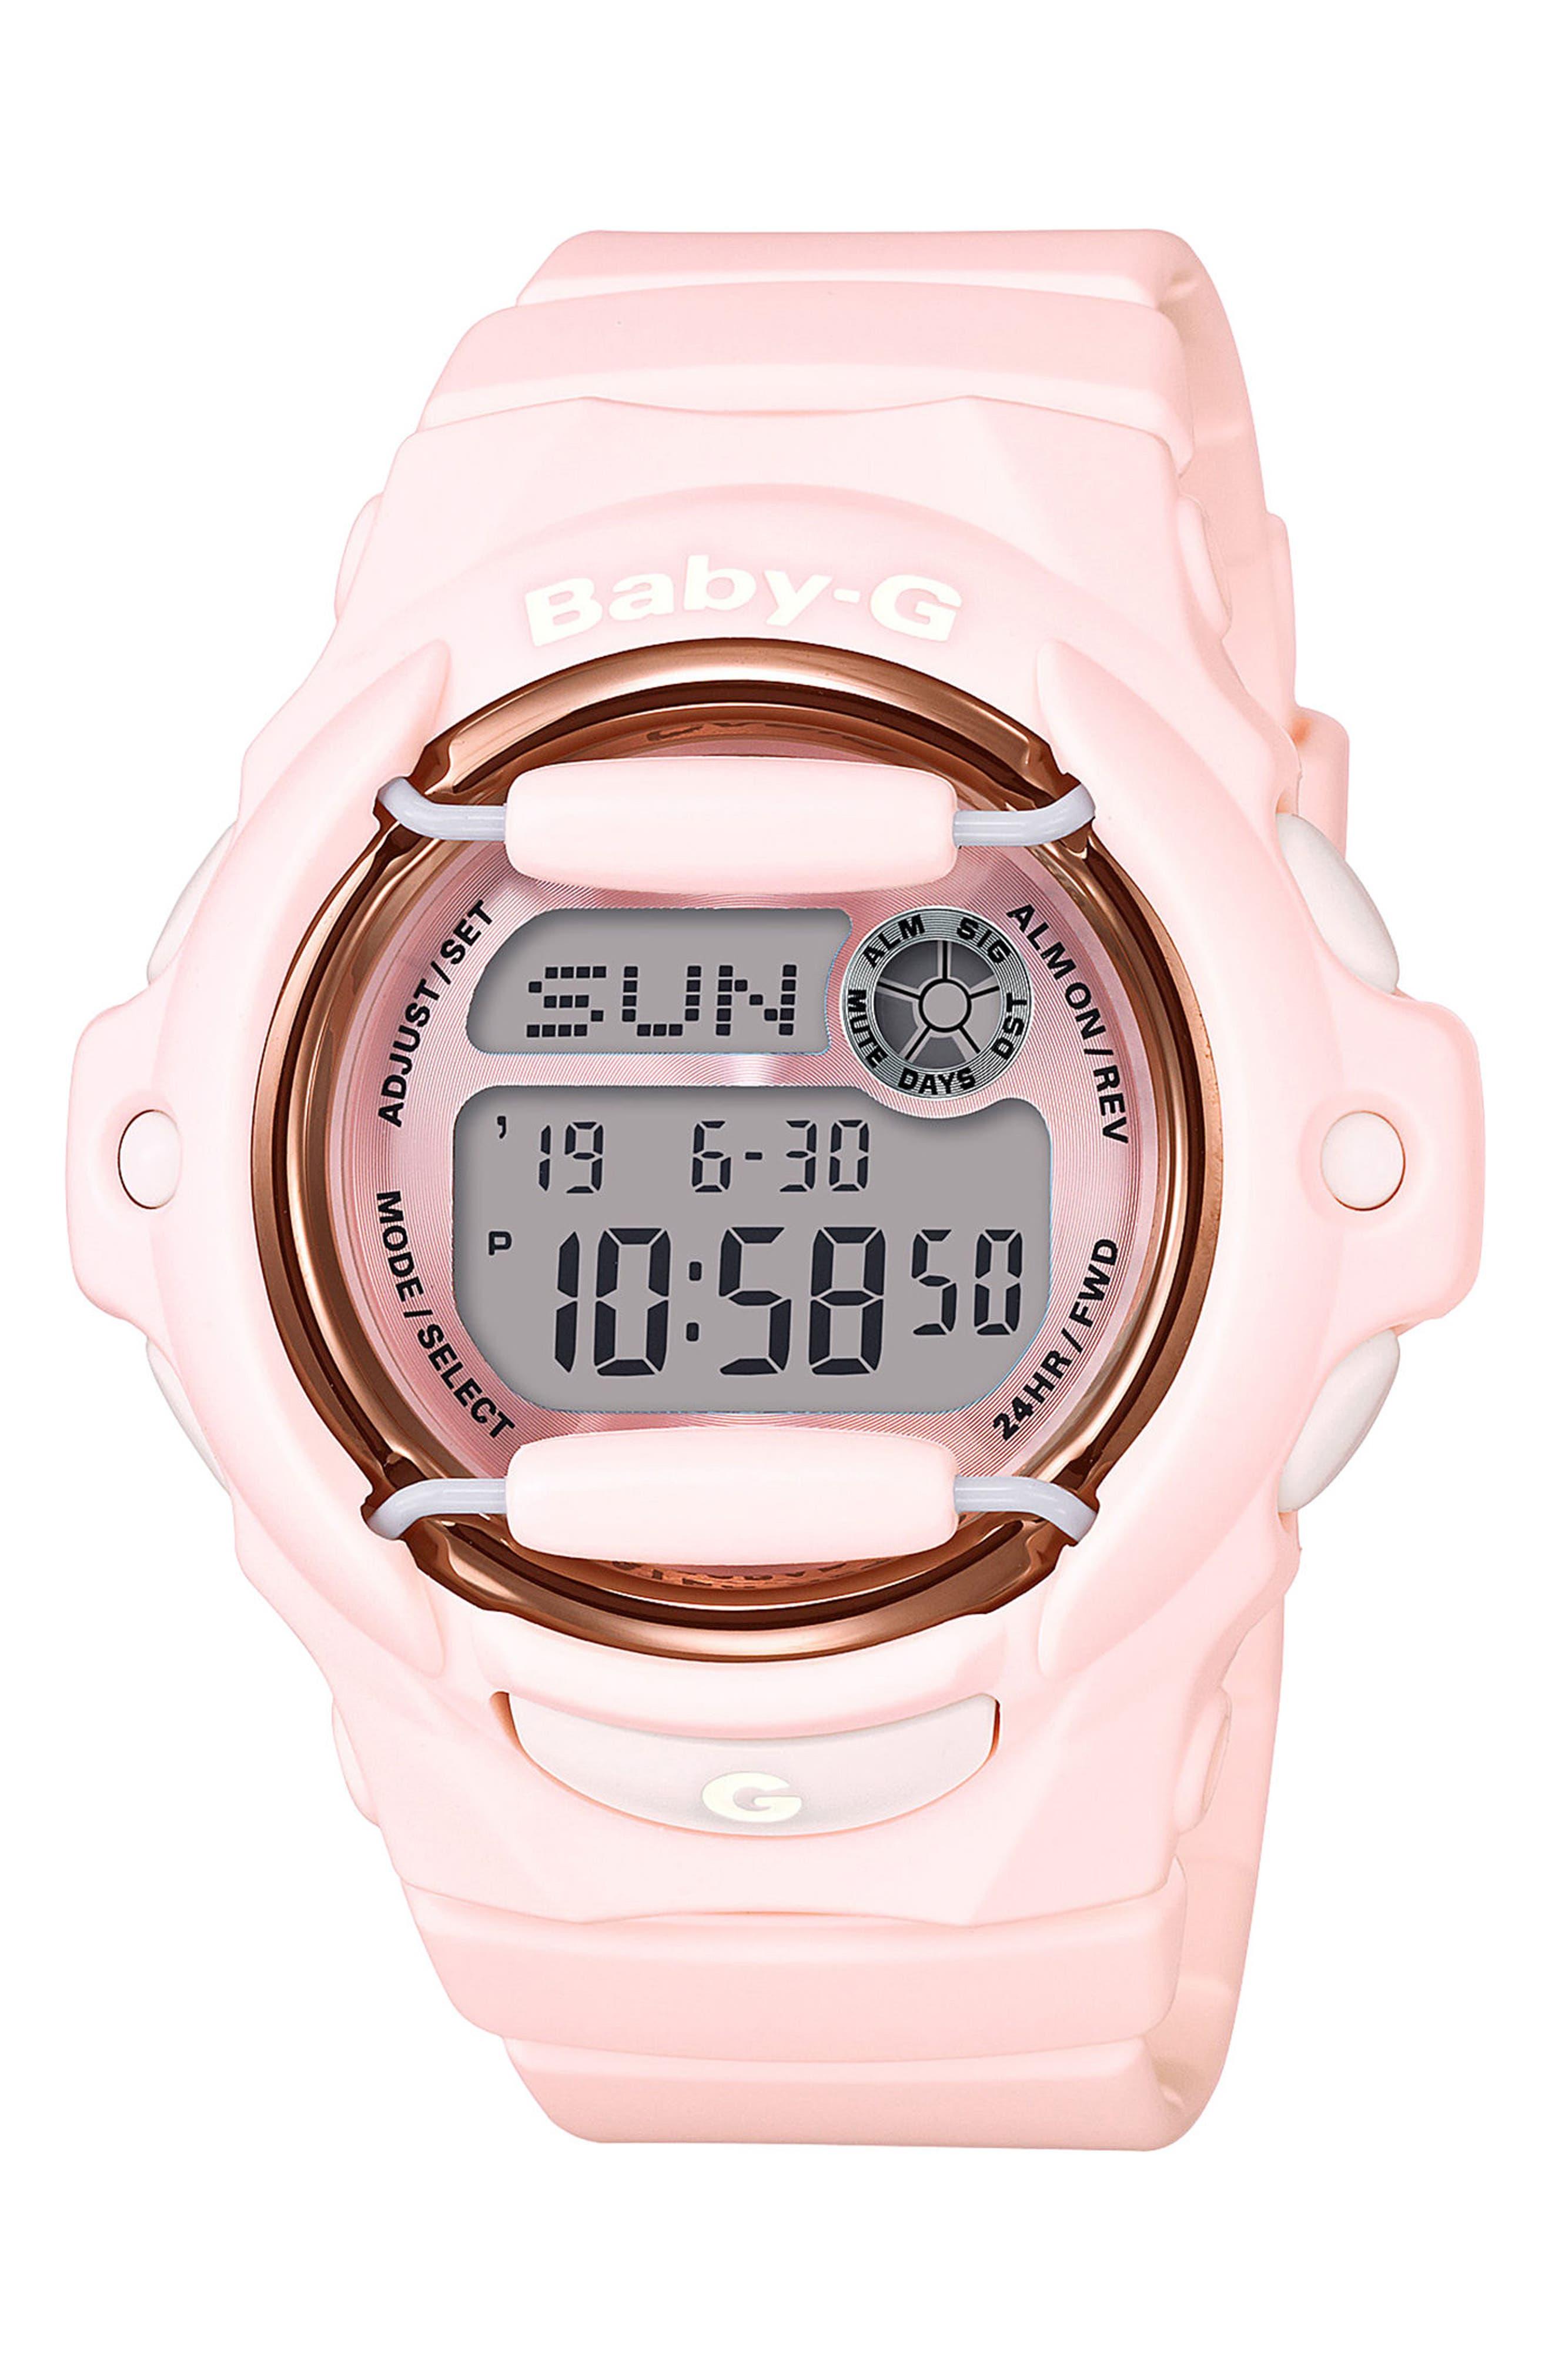 Main Image - G-Shock Baby-G Resin Ana-Digi Watch, 42.6mm